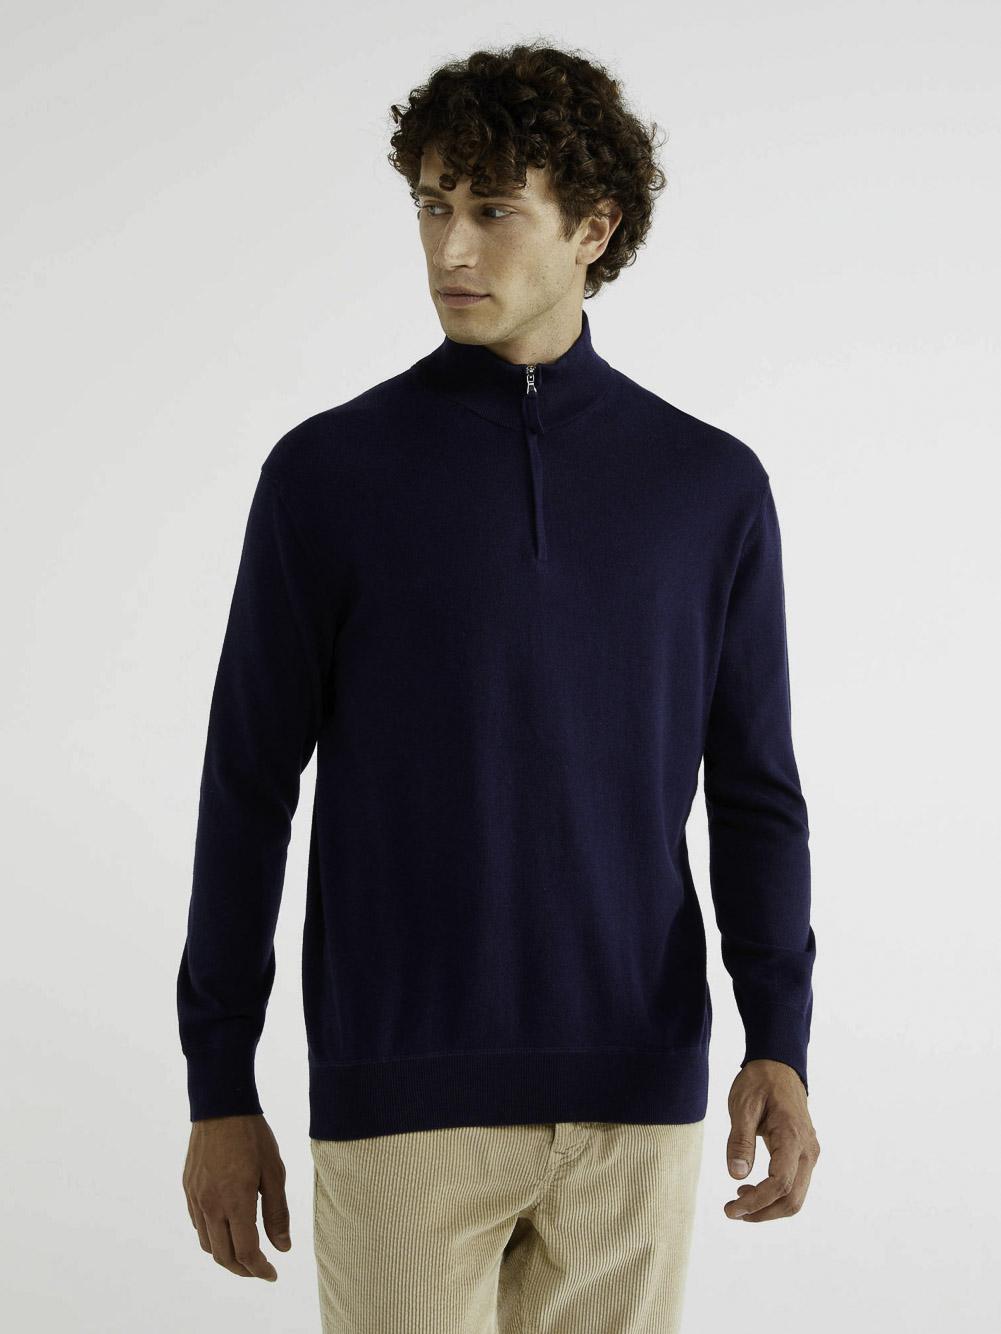 BENETTON Μπλούζα ζιβάγκο με φερμουάρ 1150K7106 20A016